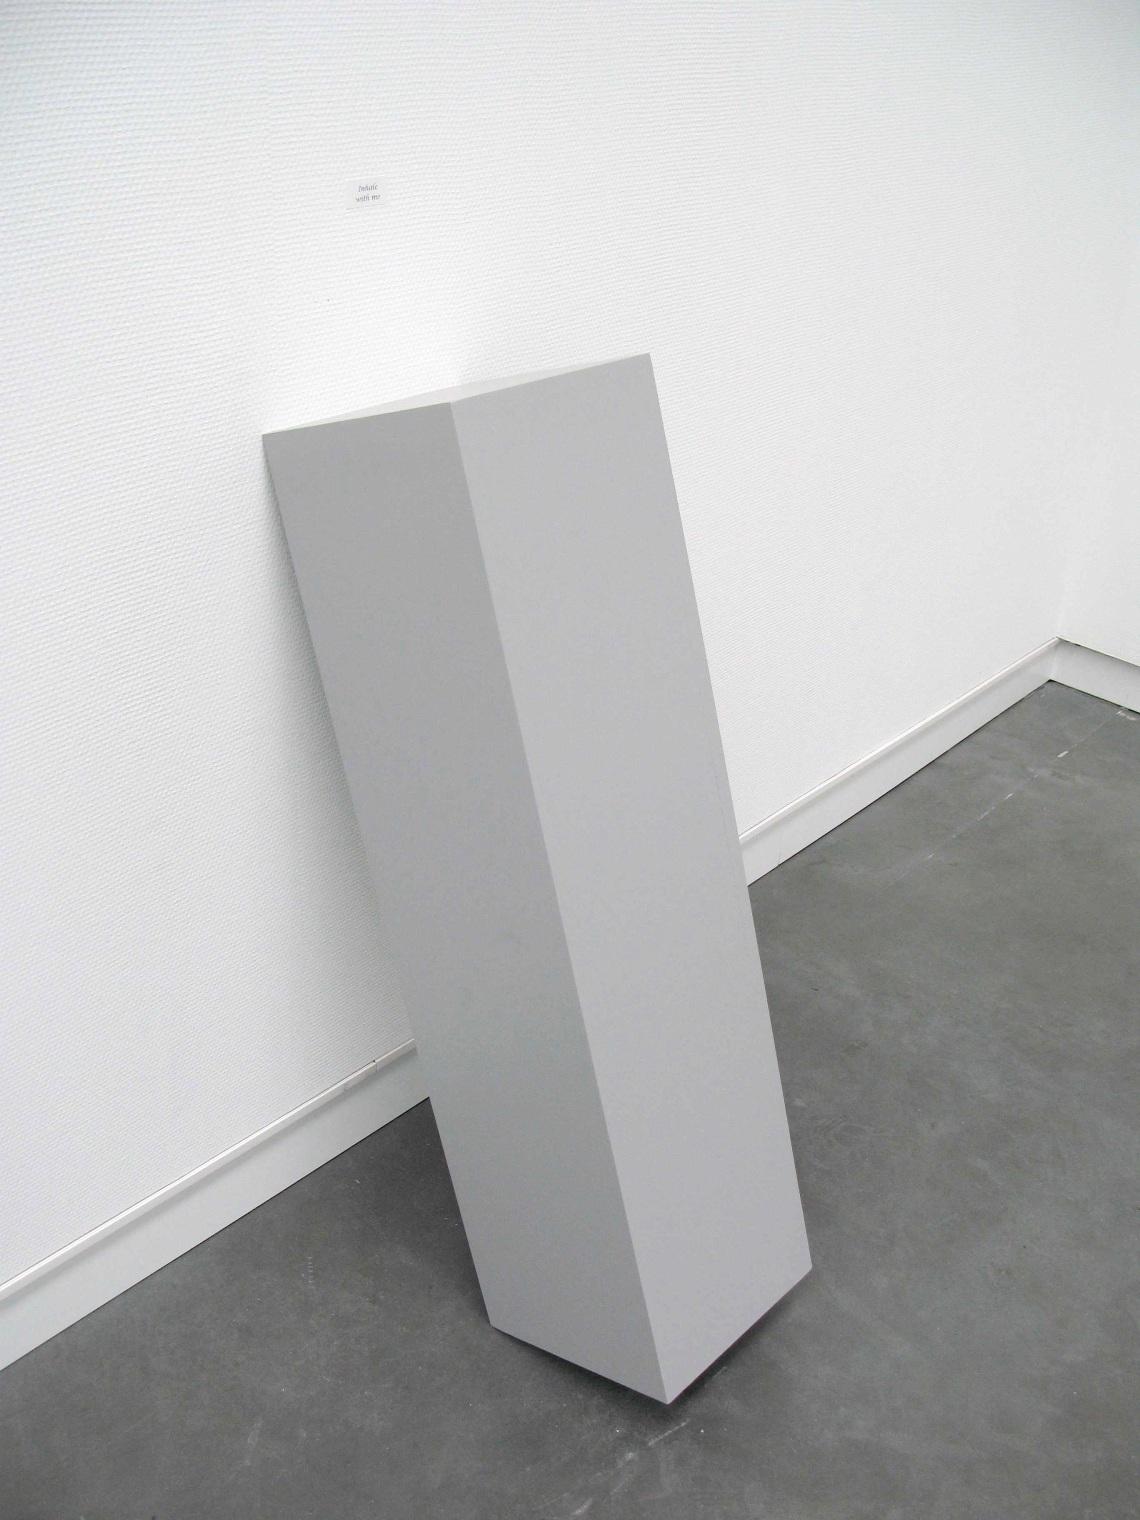 Inhale with me | Karin van Pinxteren | pedestal + stamp | Museum De Pont